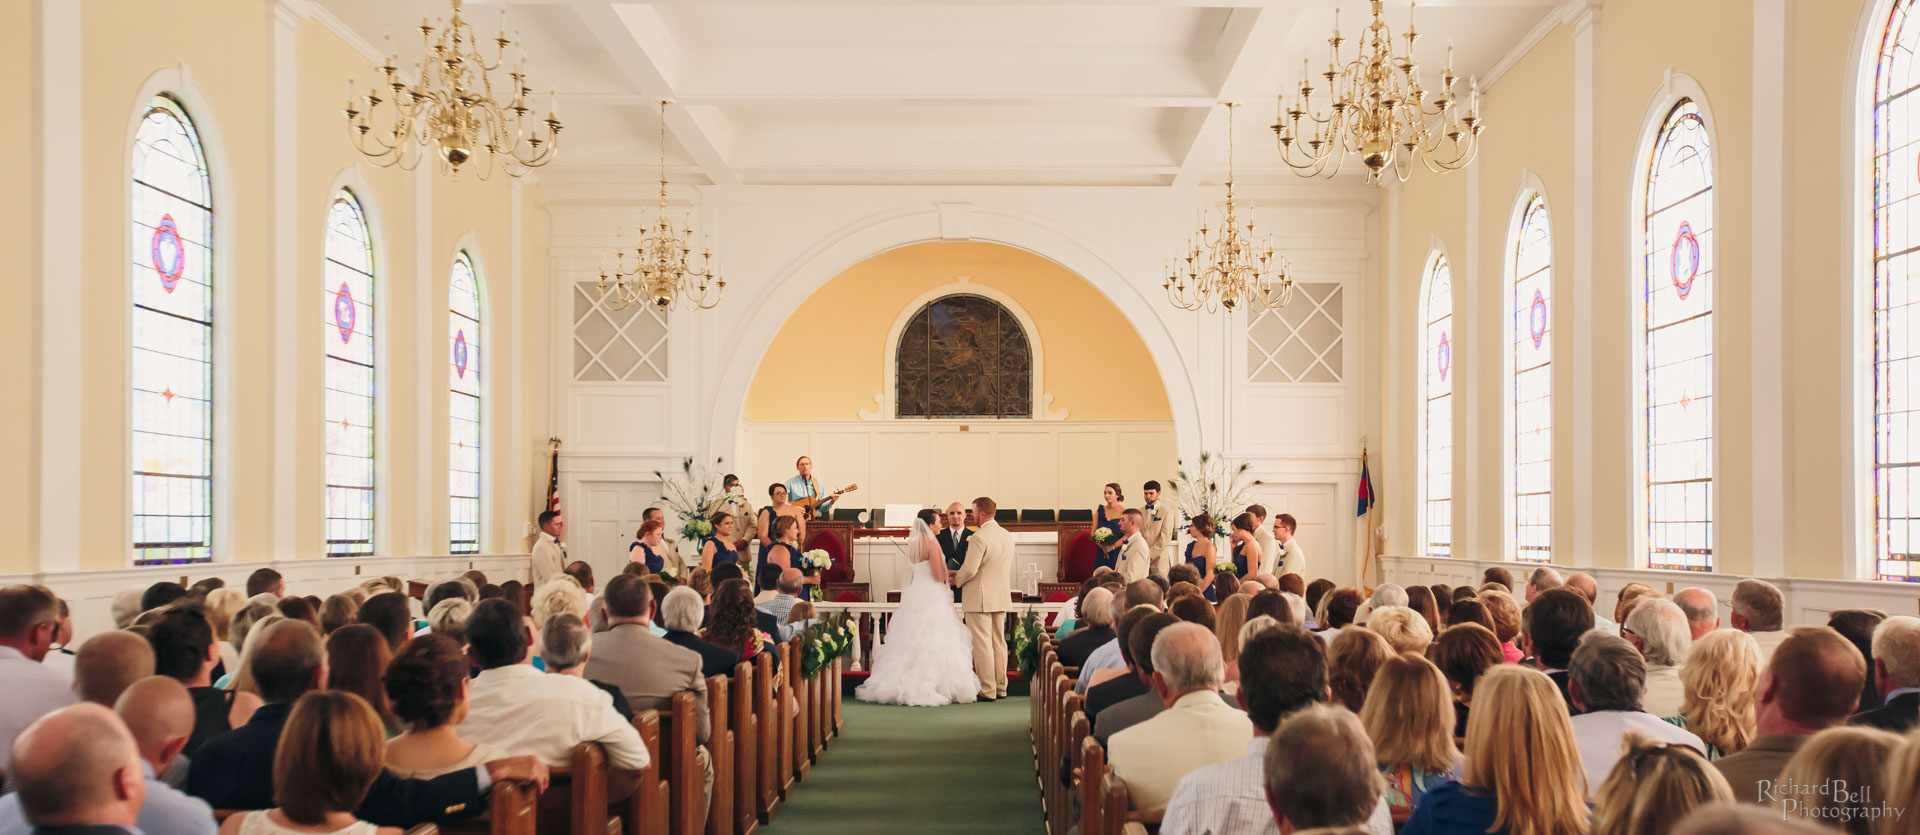 Felkel Church Ceremony